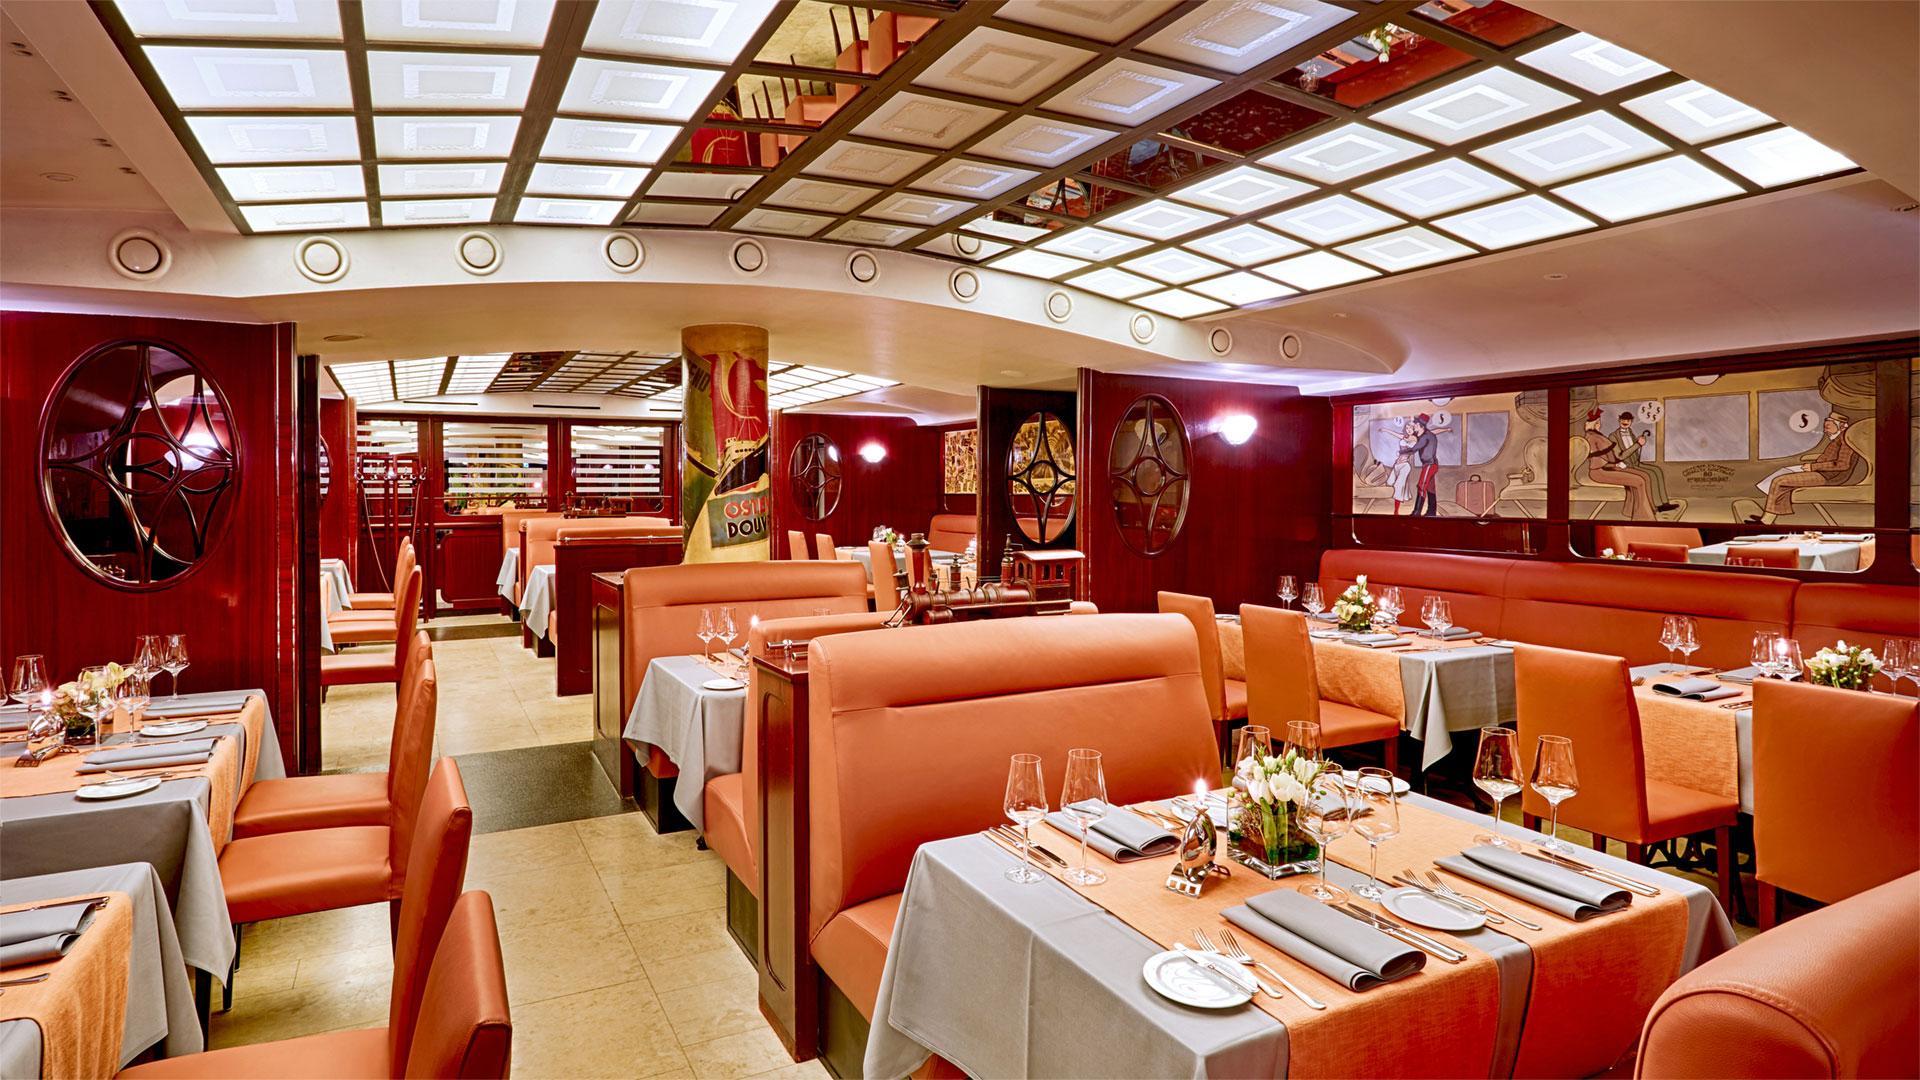 Park Hotel Restaurant Steaktrain Culinary Highlights In Leipzig City Centre